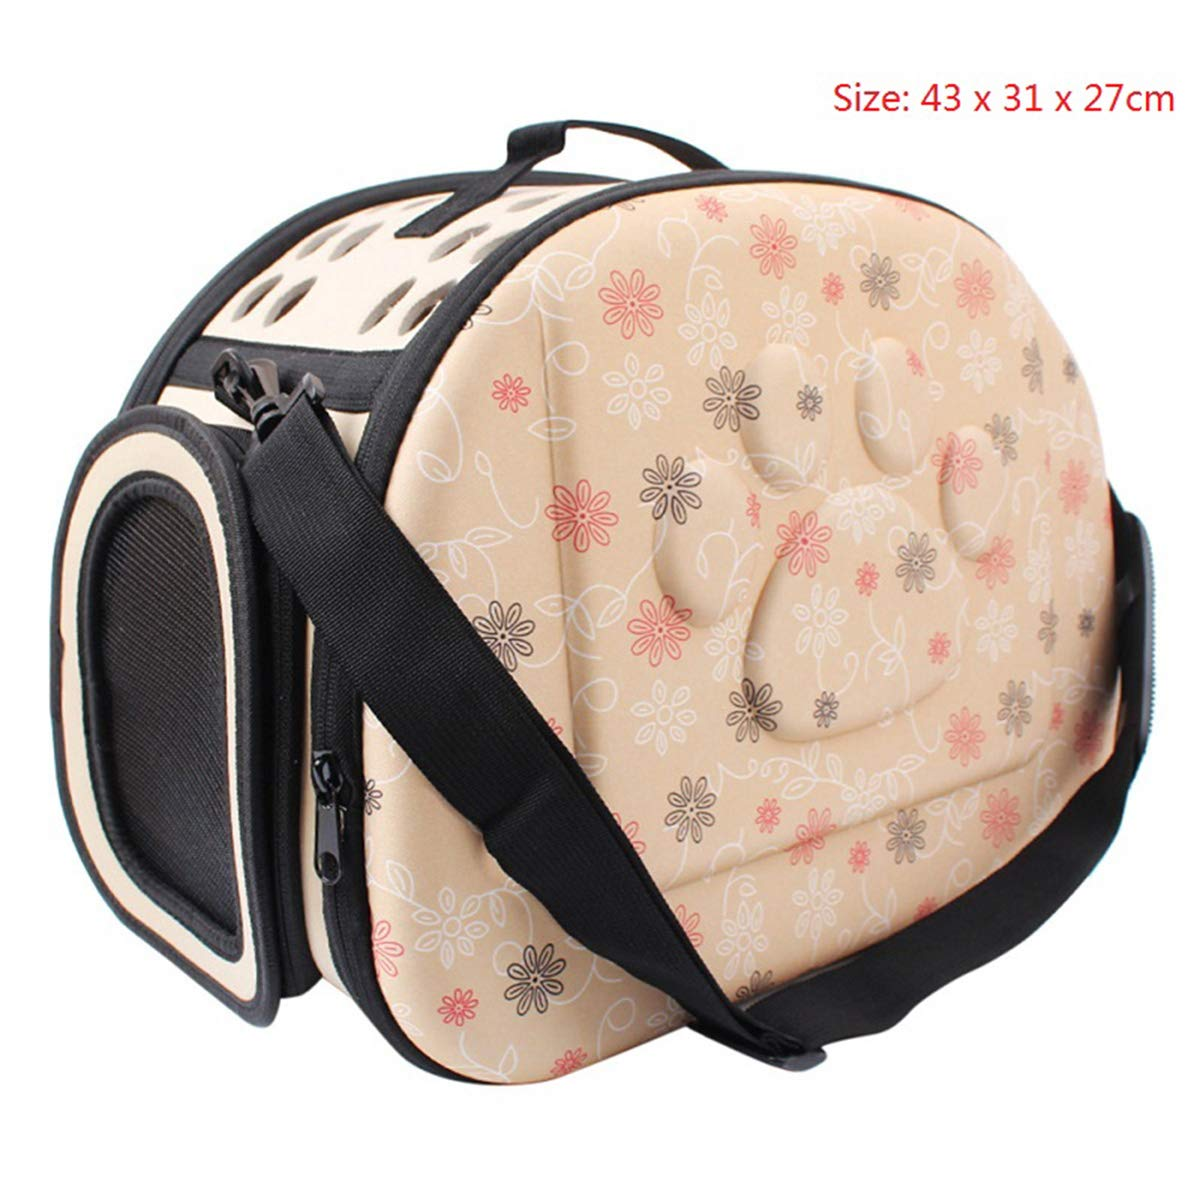 3 come PicturePETFDH Travel Pet Dog Carrier Puppy Cat che porta borse esterne per Small Dog Shoulder Bag Soft Animali domestici Cane Kennel Pet Products 3 Colors 06